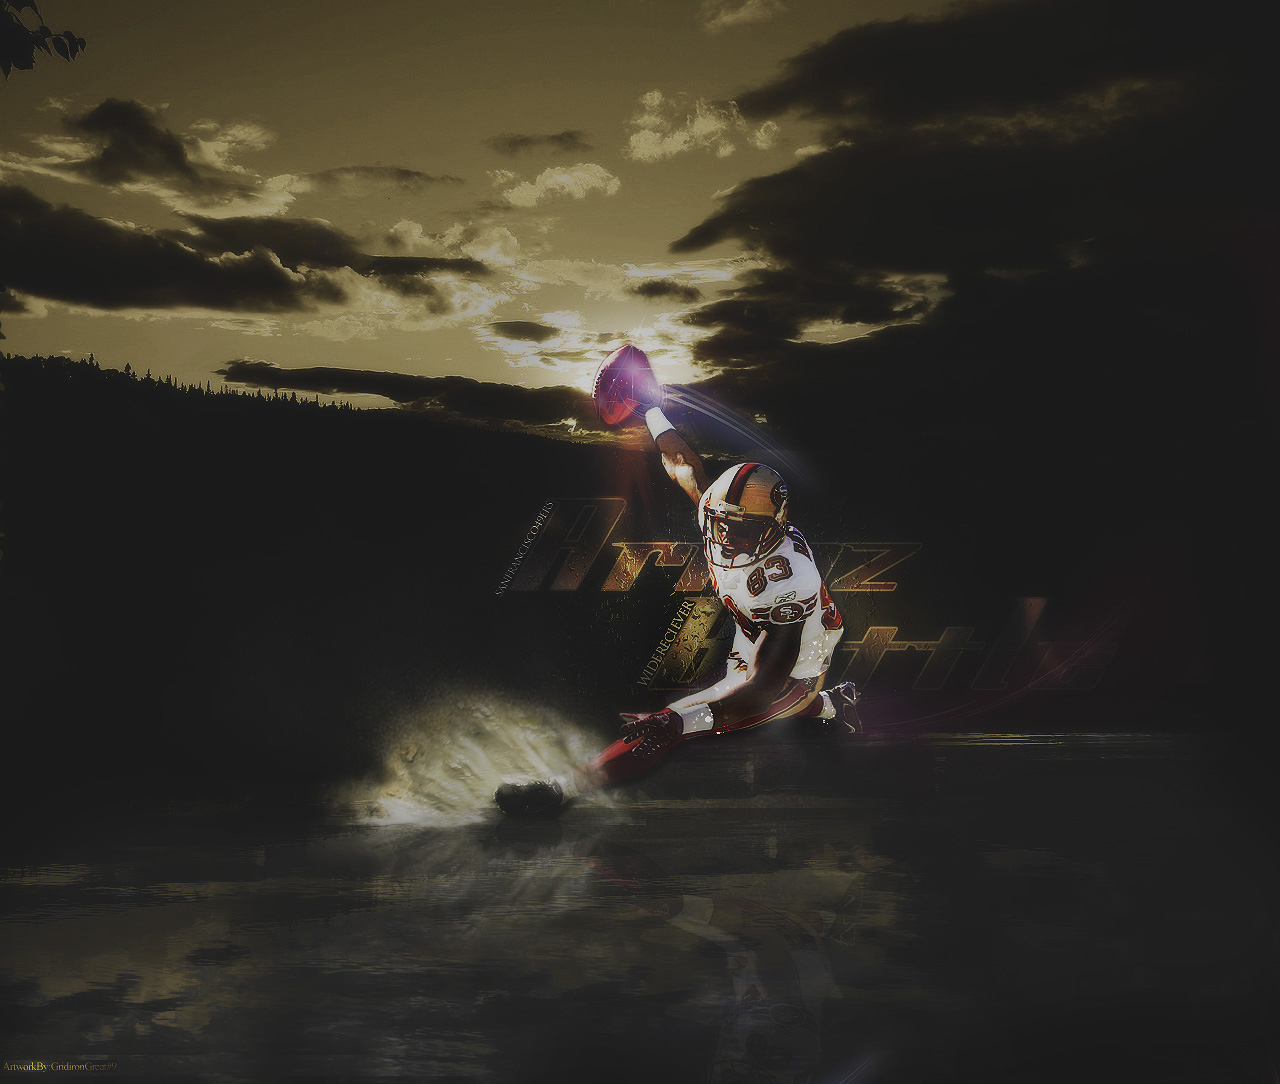 http://1.bp.blogspot.com/_SPY5-z18DBU/TTzrXoosbGI/AAAAAAAAAqw/QbgagaMwWn8/s1600/arnaz_battle_wallpaper_san_francisco_49ers_1280x1024.jpeg